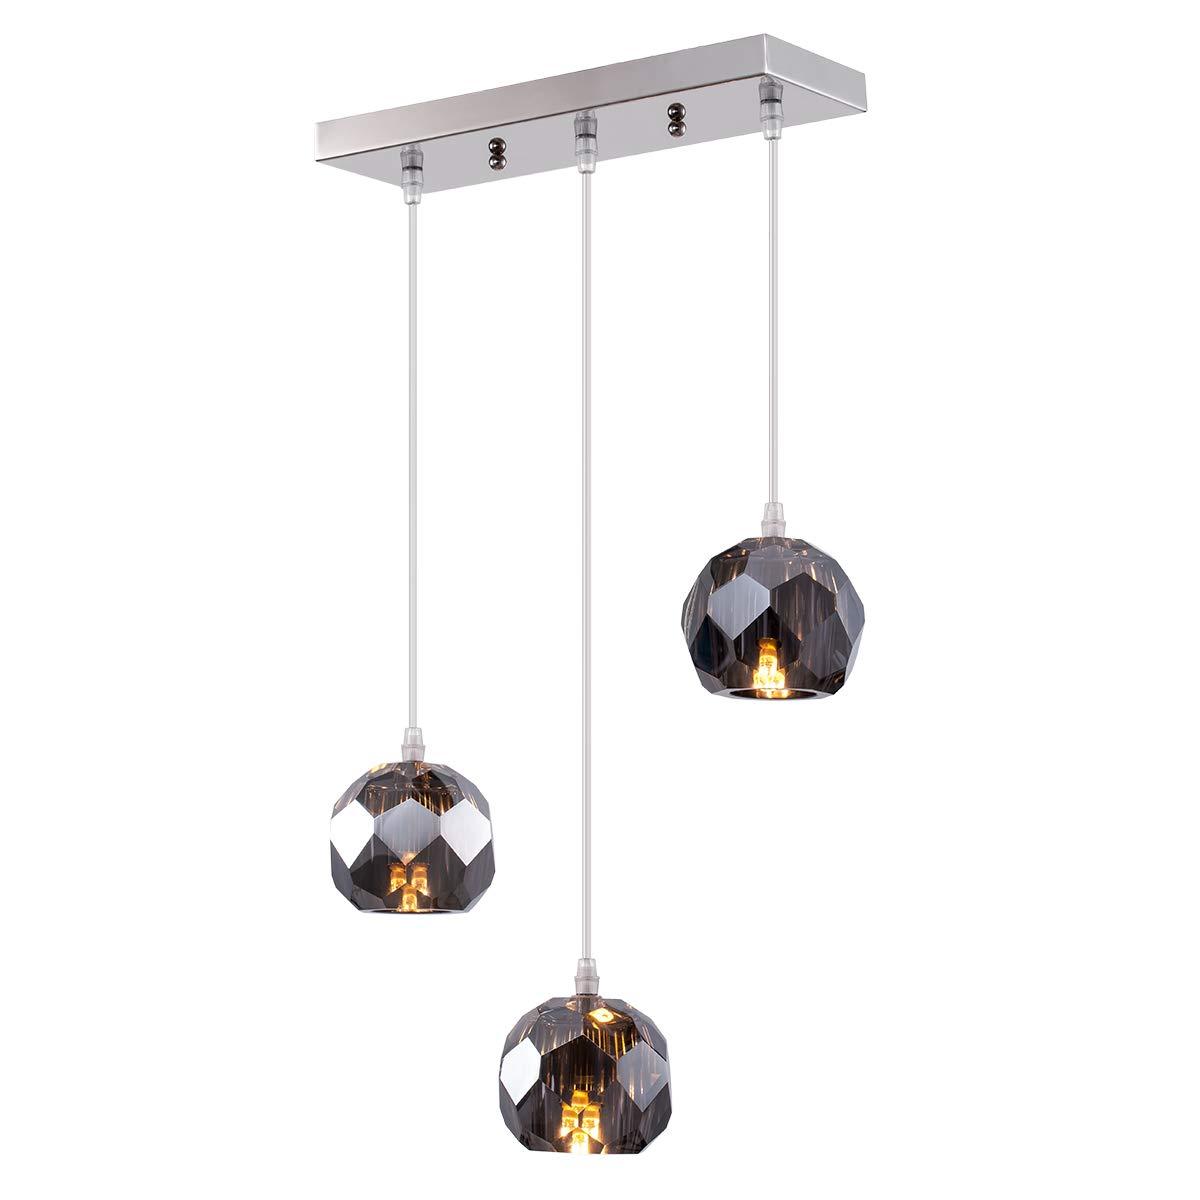 Fancy Crystal Globe Pendant Lighting, Nickel Plating Indoor Decorative Ceiling Pendant Light Fixture for Above Dinning Table Kitchen Island Living Room Bar 3-Light Smoked Grey